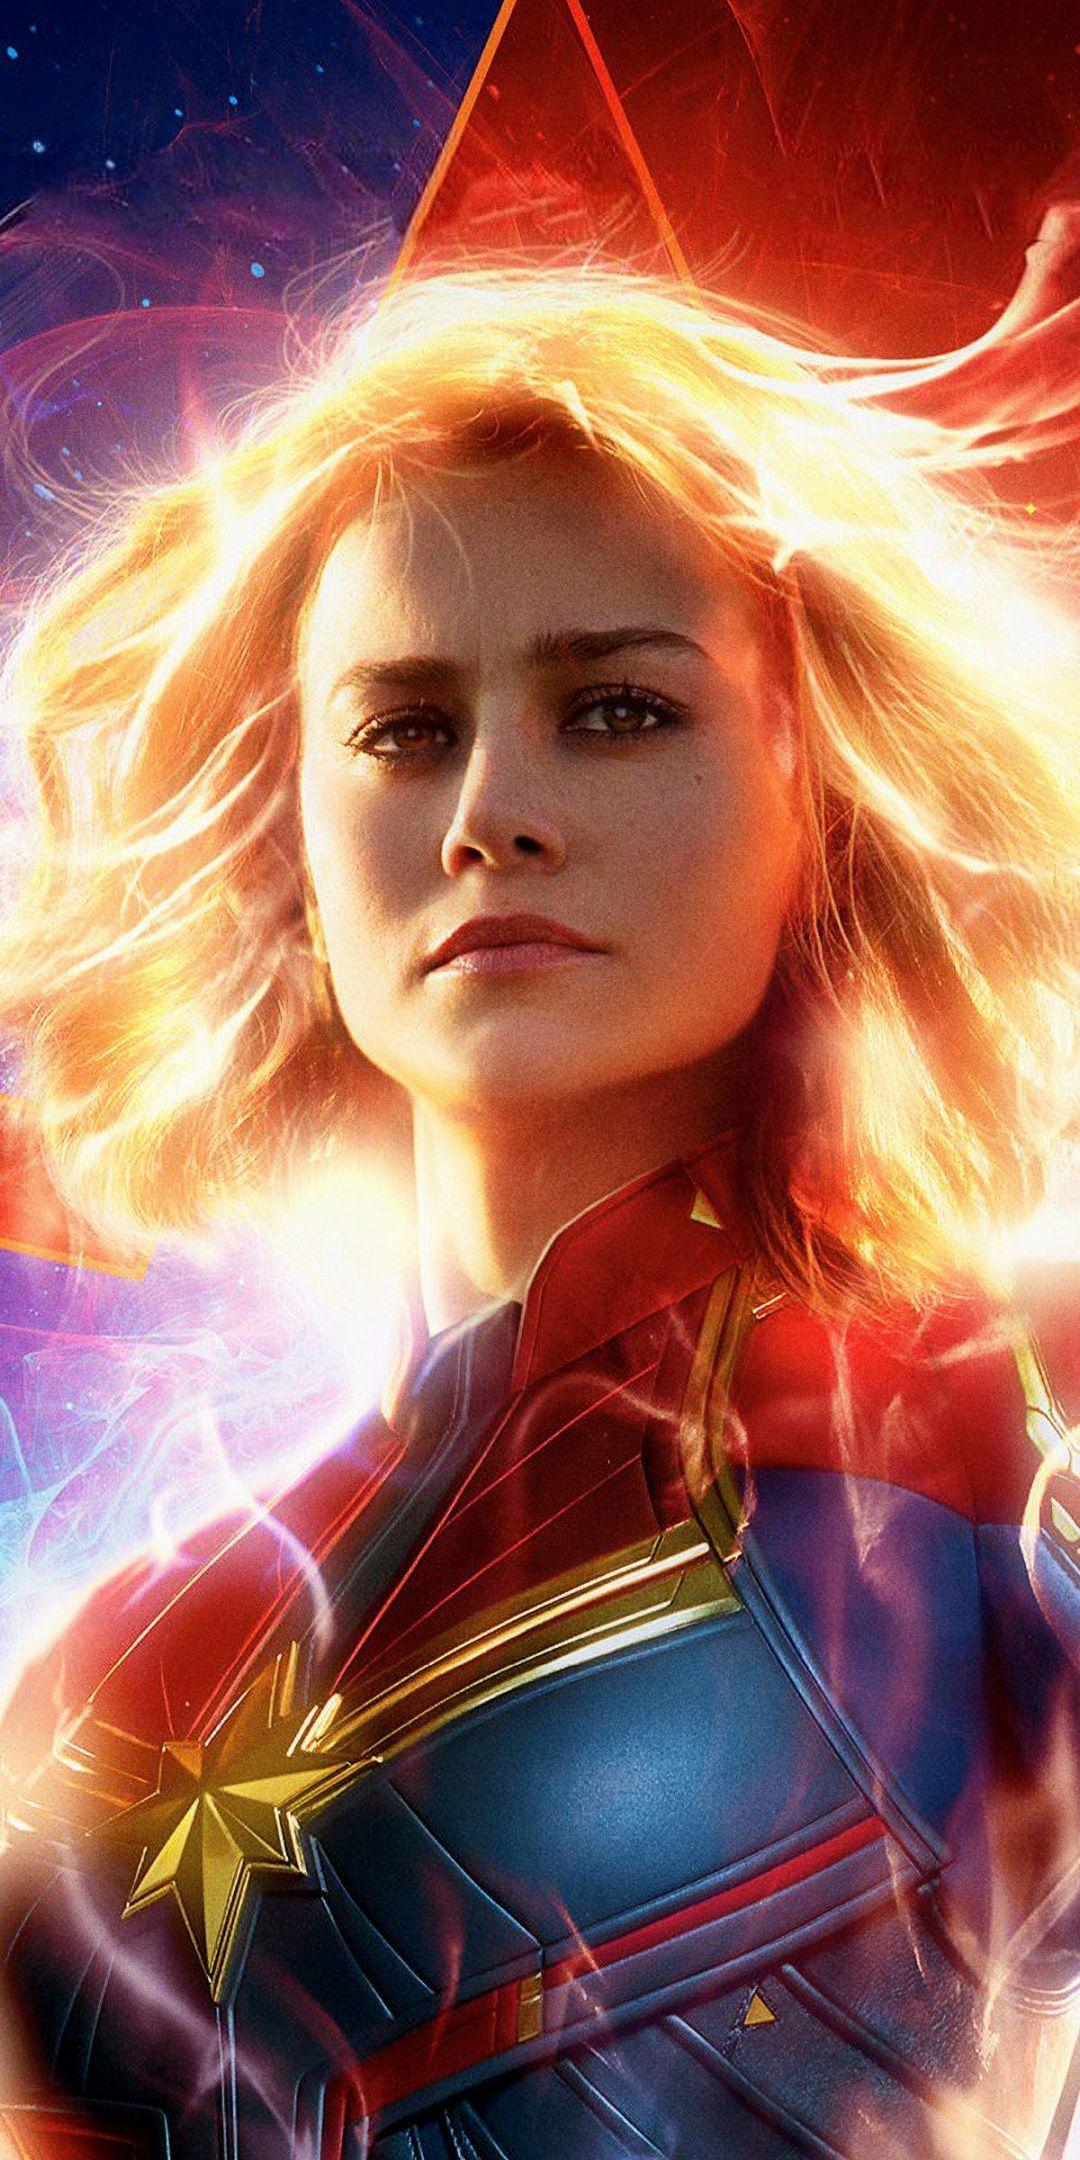 Captain Marvel Brie Larson 2019 1080x2160 wallpaper Celebrity 1080x2160